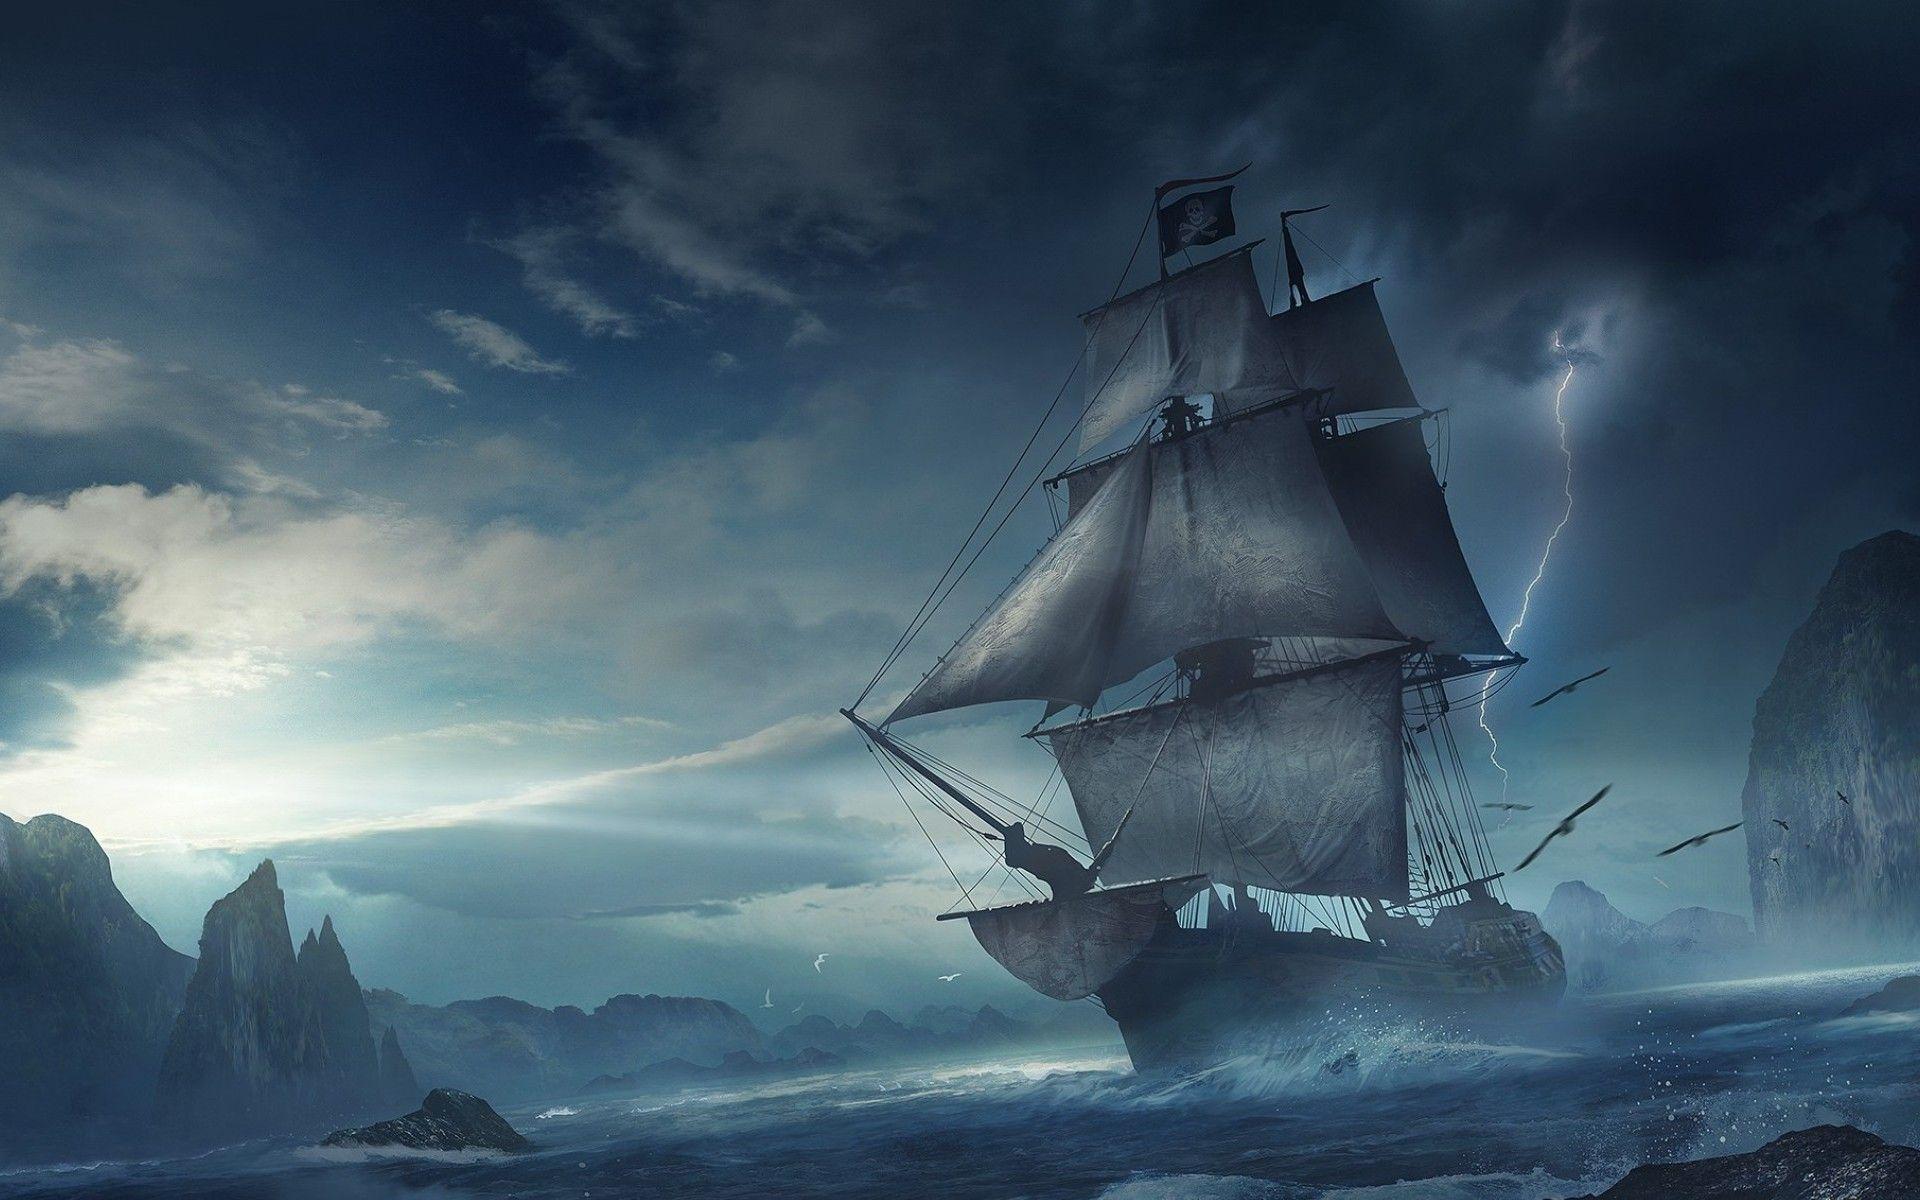 Pirate ship images fantasy ship cliff jolly roger pirate ship rock lightning wallpaper